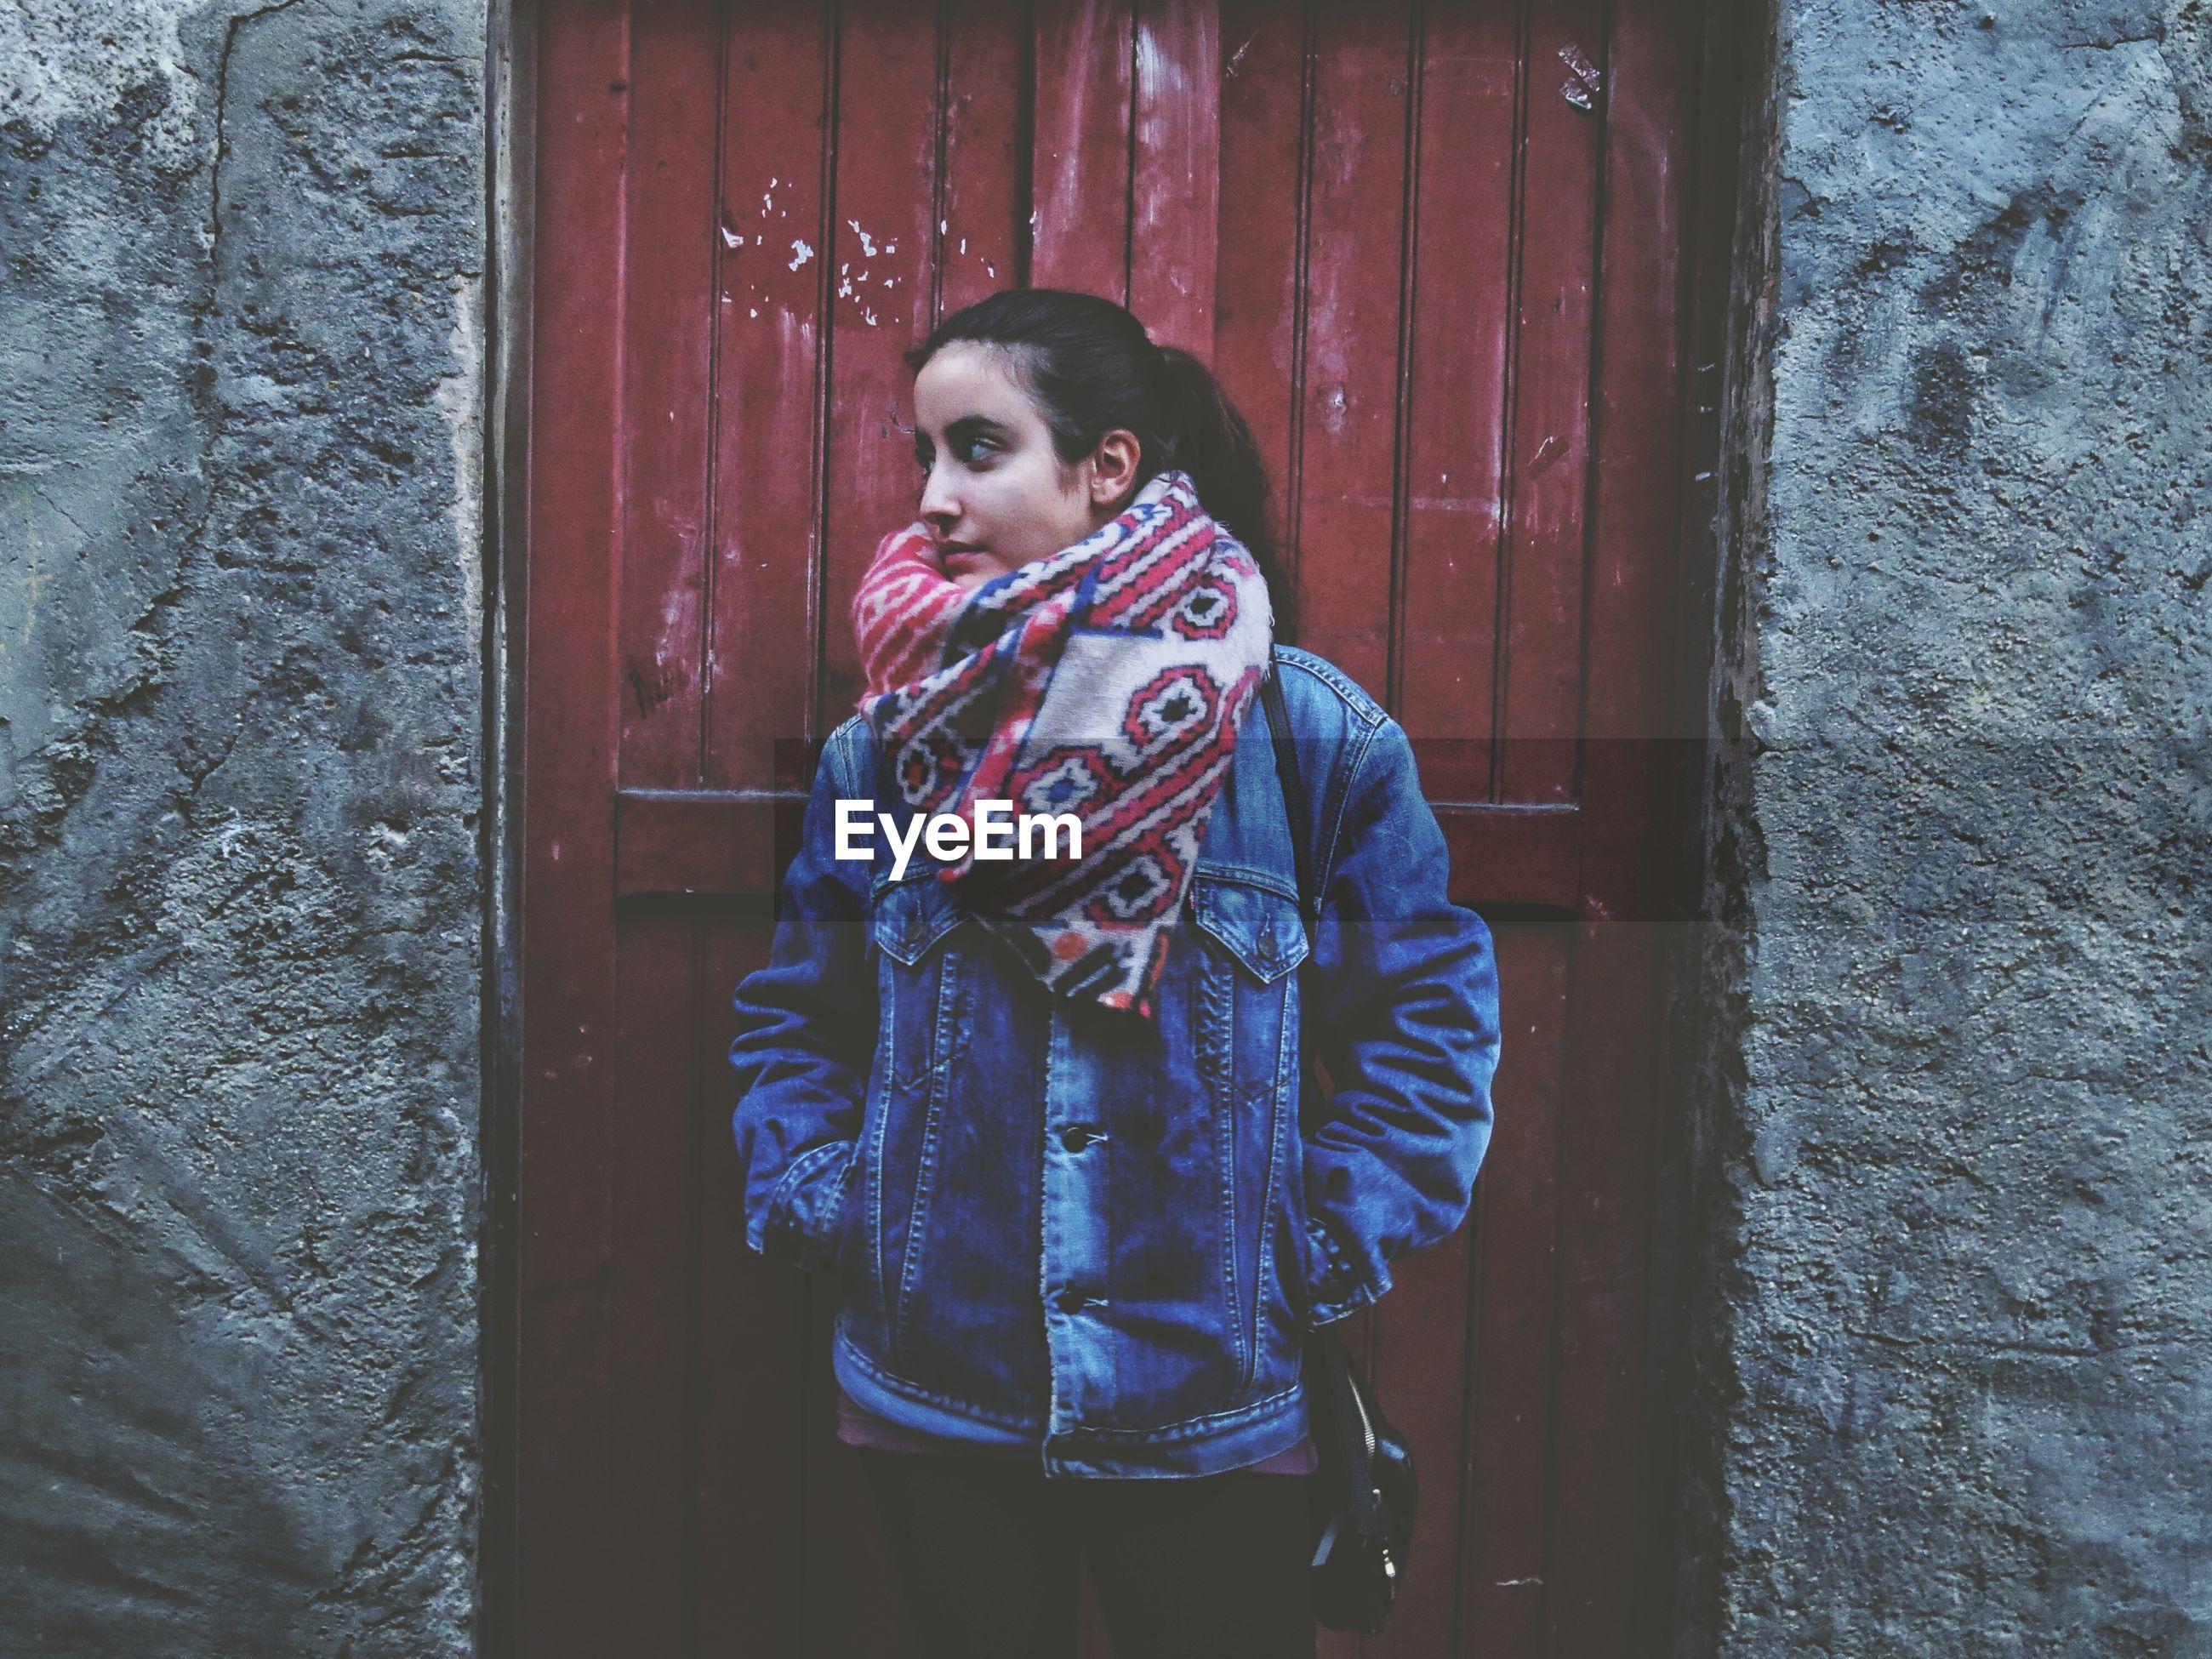 Woman wearing denim jacket